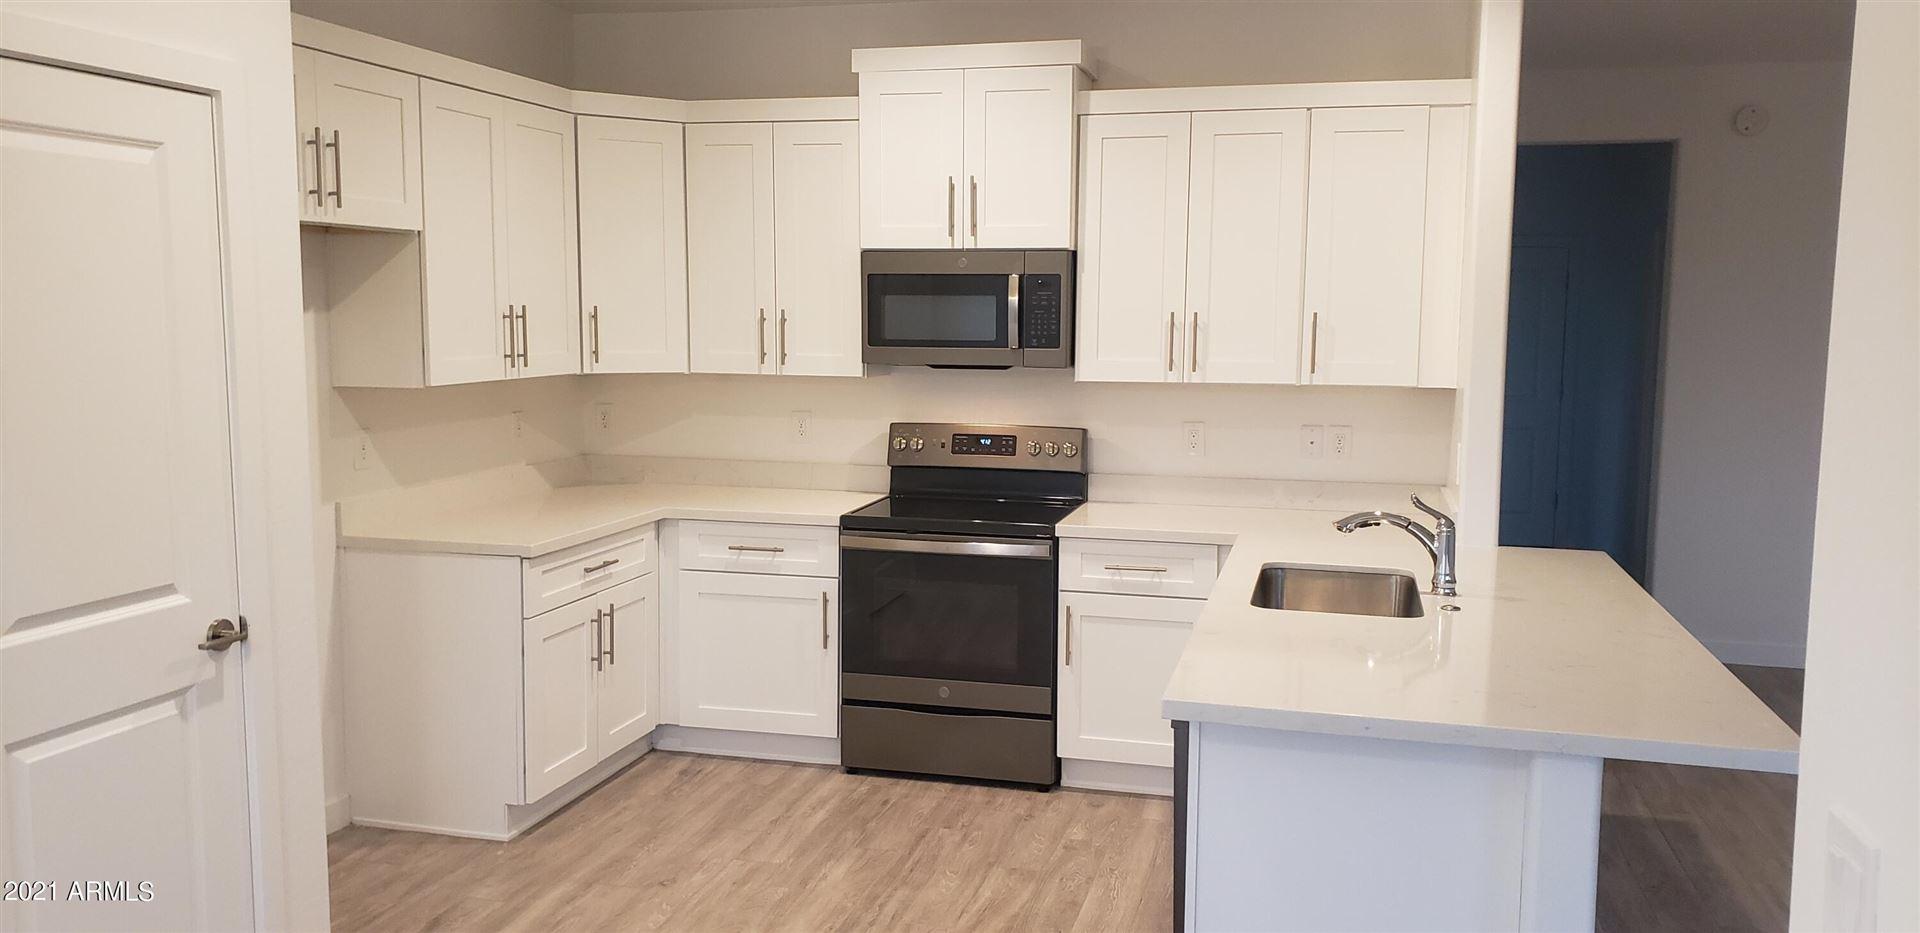 Photo of 32520 N 225th Avenue, Wittmann, AZ 85361 (MLS # 6304056)